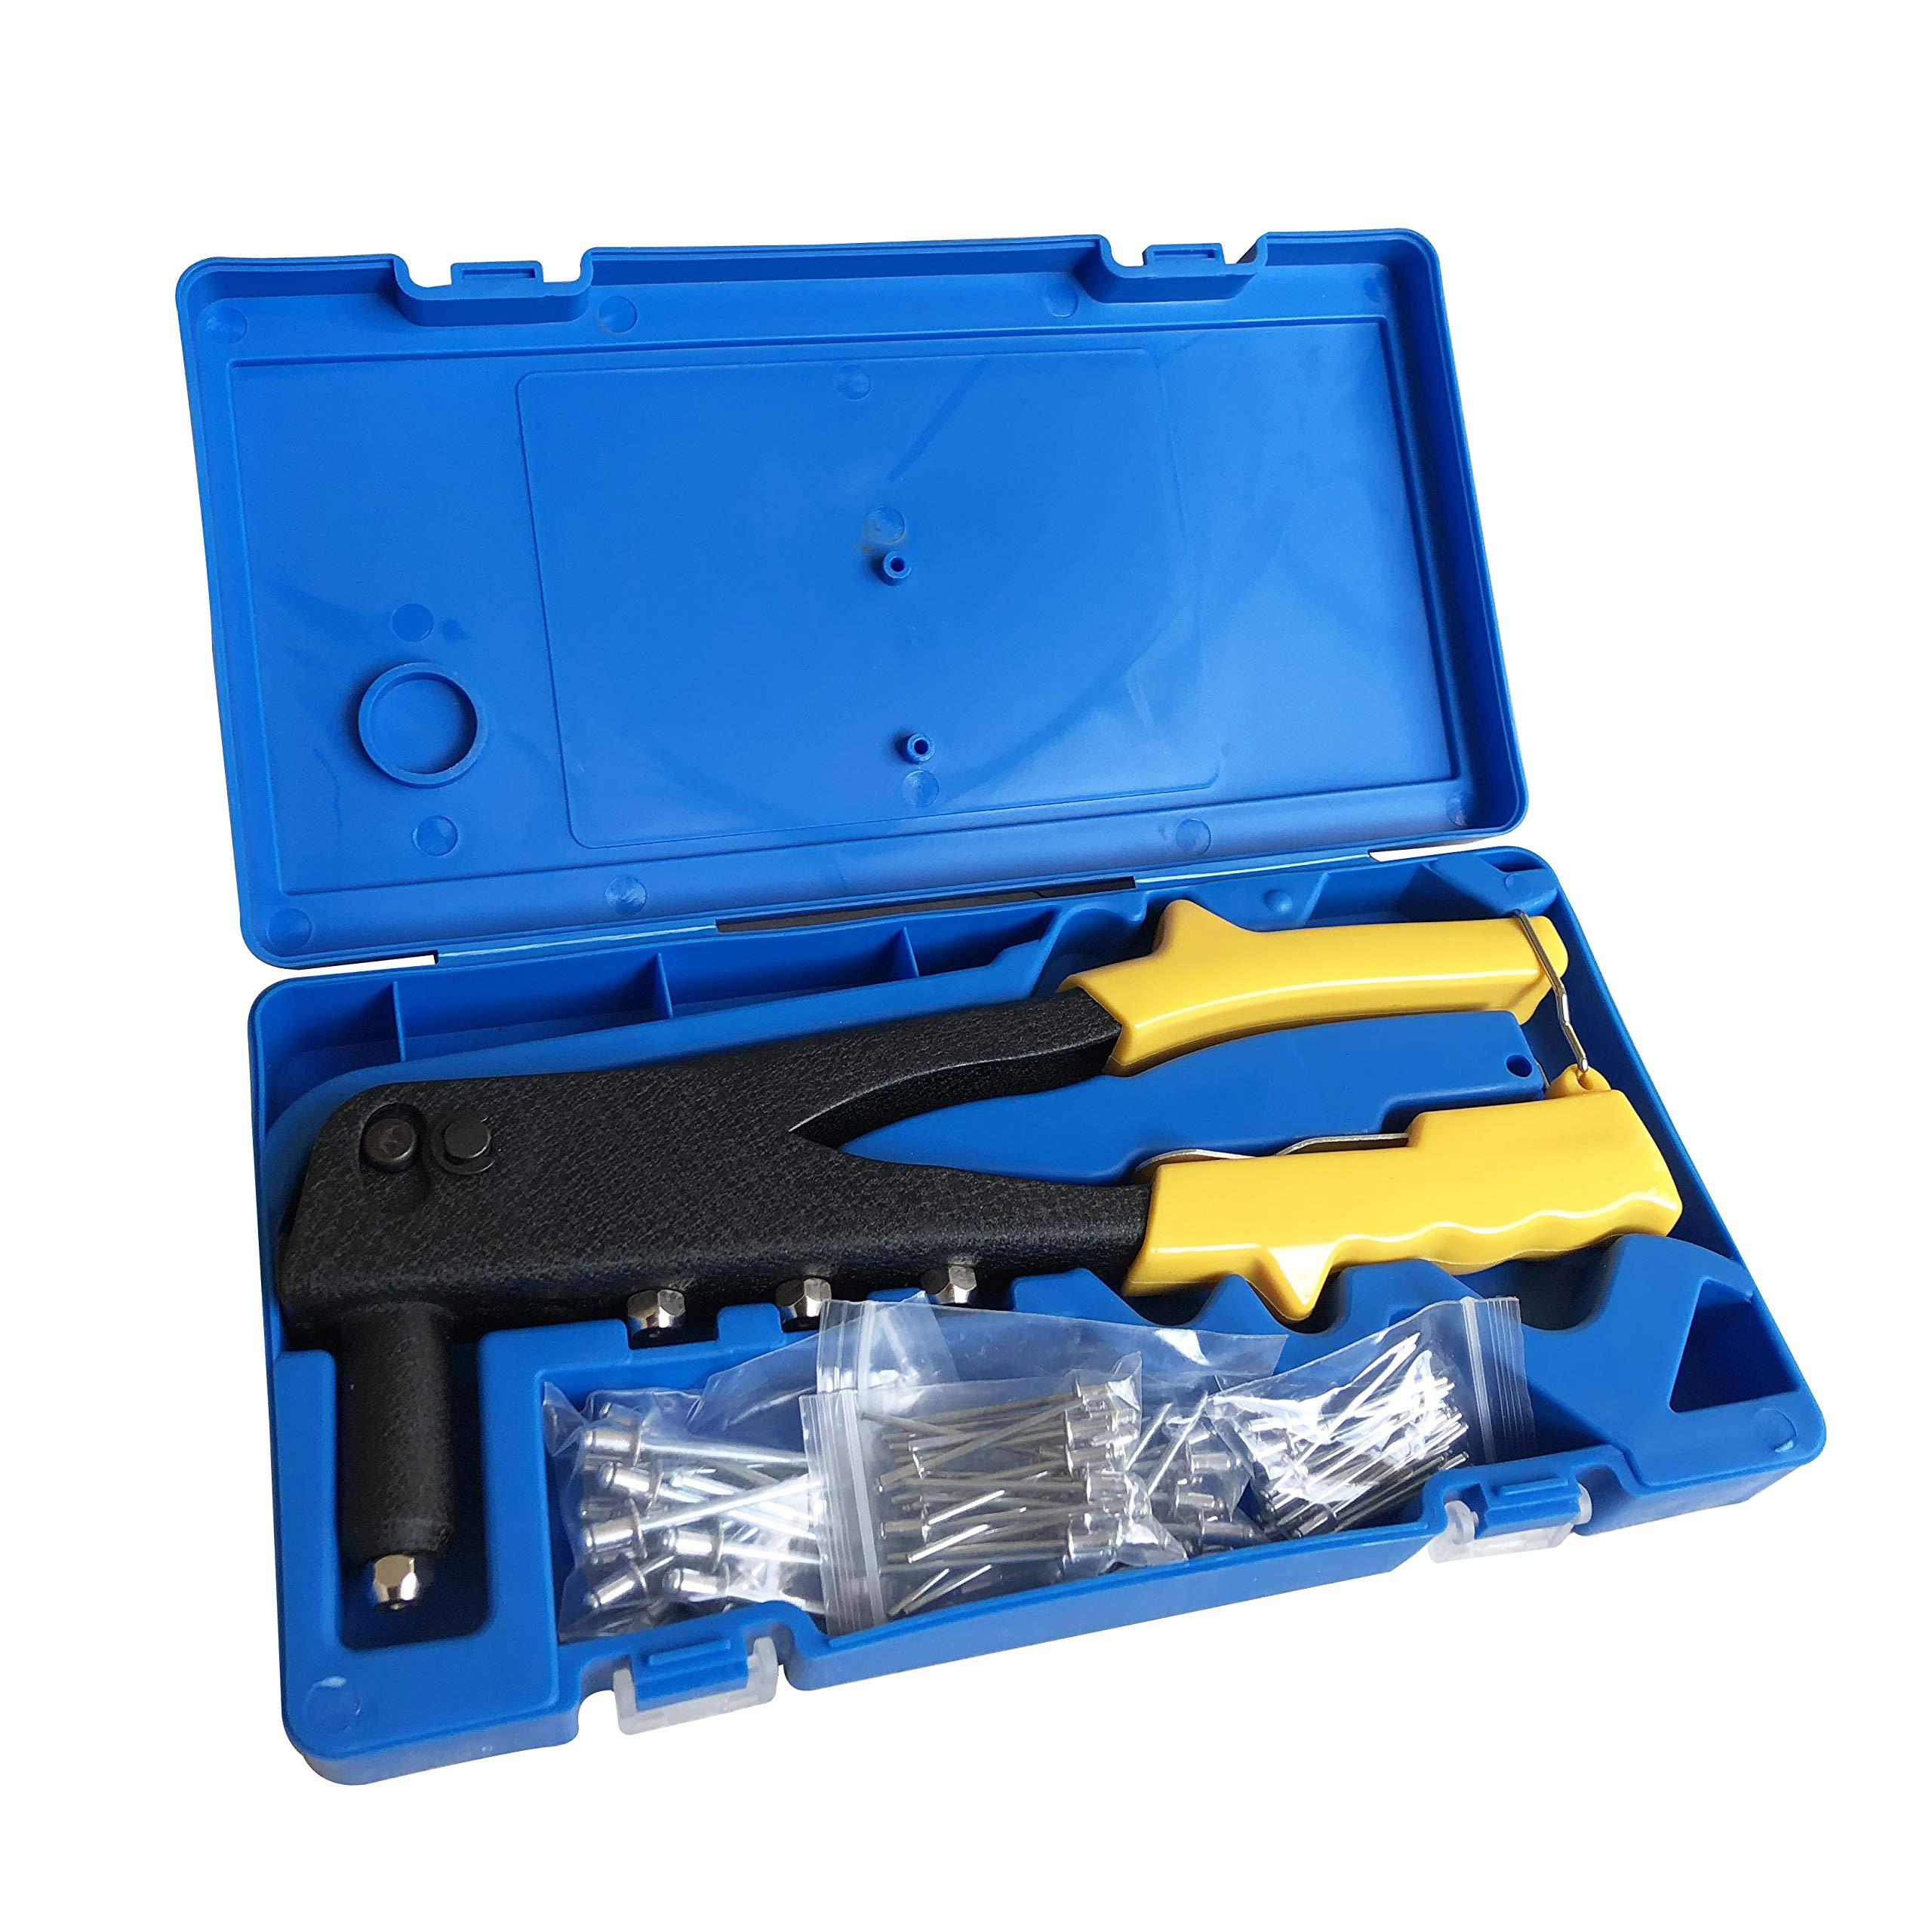 Pop Rivet Gun, Rivet Gun Kit, Riveter, Hand Repair Fastening Tools, Heavy Duty Hand Riveter, Heavy Duty Riveter for Sheet Metal Wooden Plastic Automotive and Duct Work, with 80 PCS Rivets